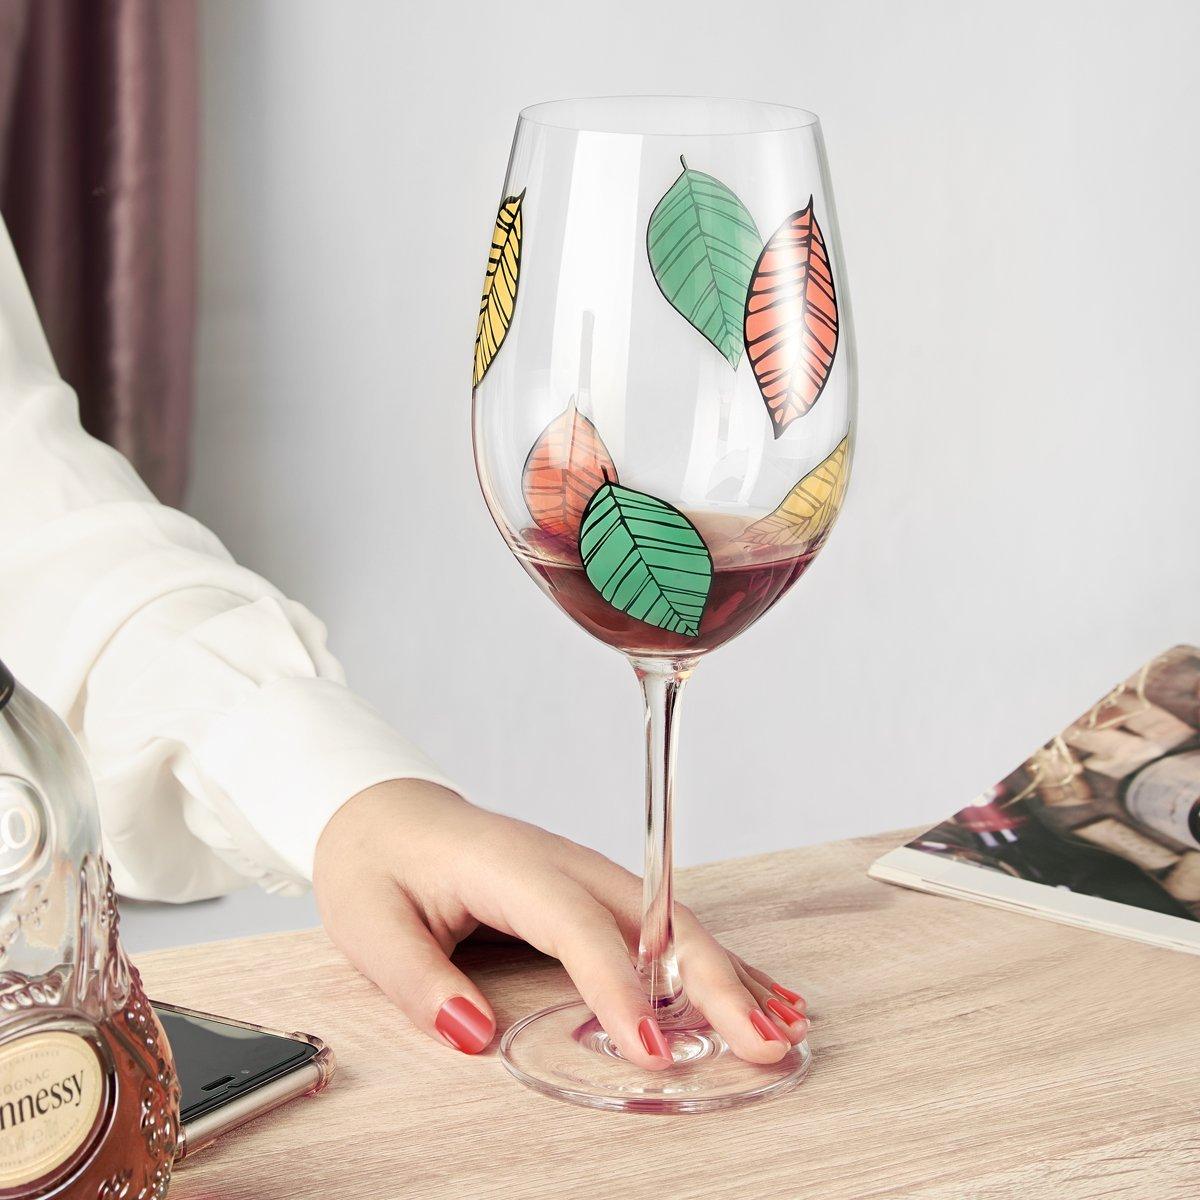 Wine Glass, 16 OZ Classy Red/White Wine Glass, Unique Leaf Patterns Arts Design Goblet, Lead-Free Premium Crystal Glass 9\